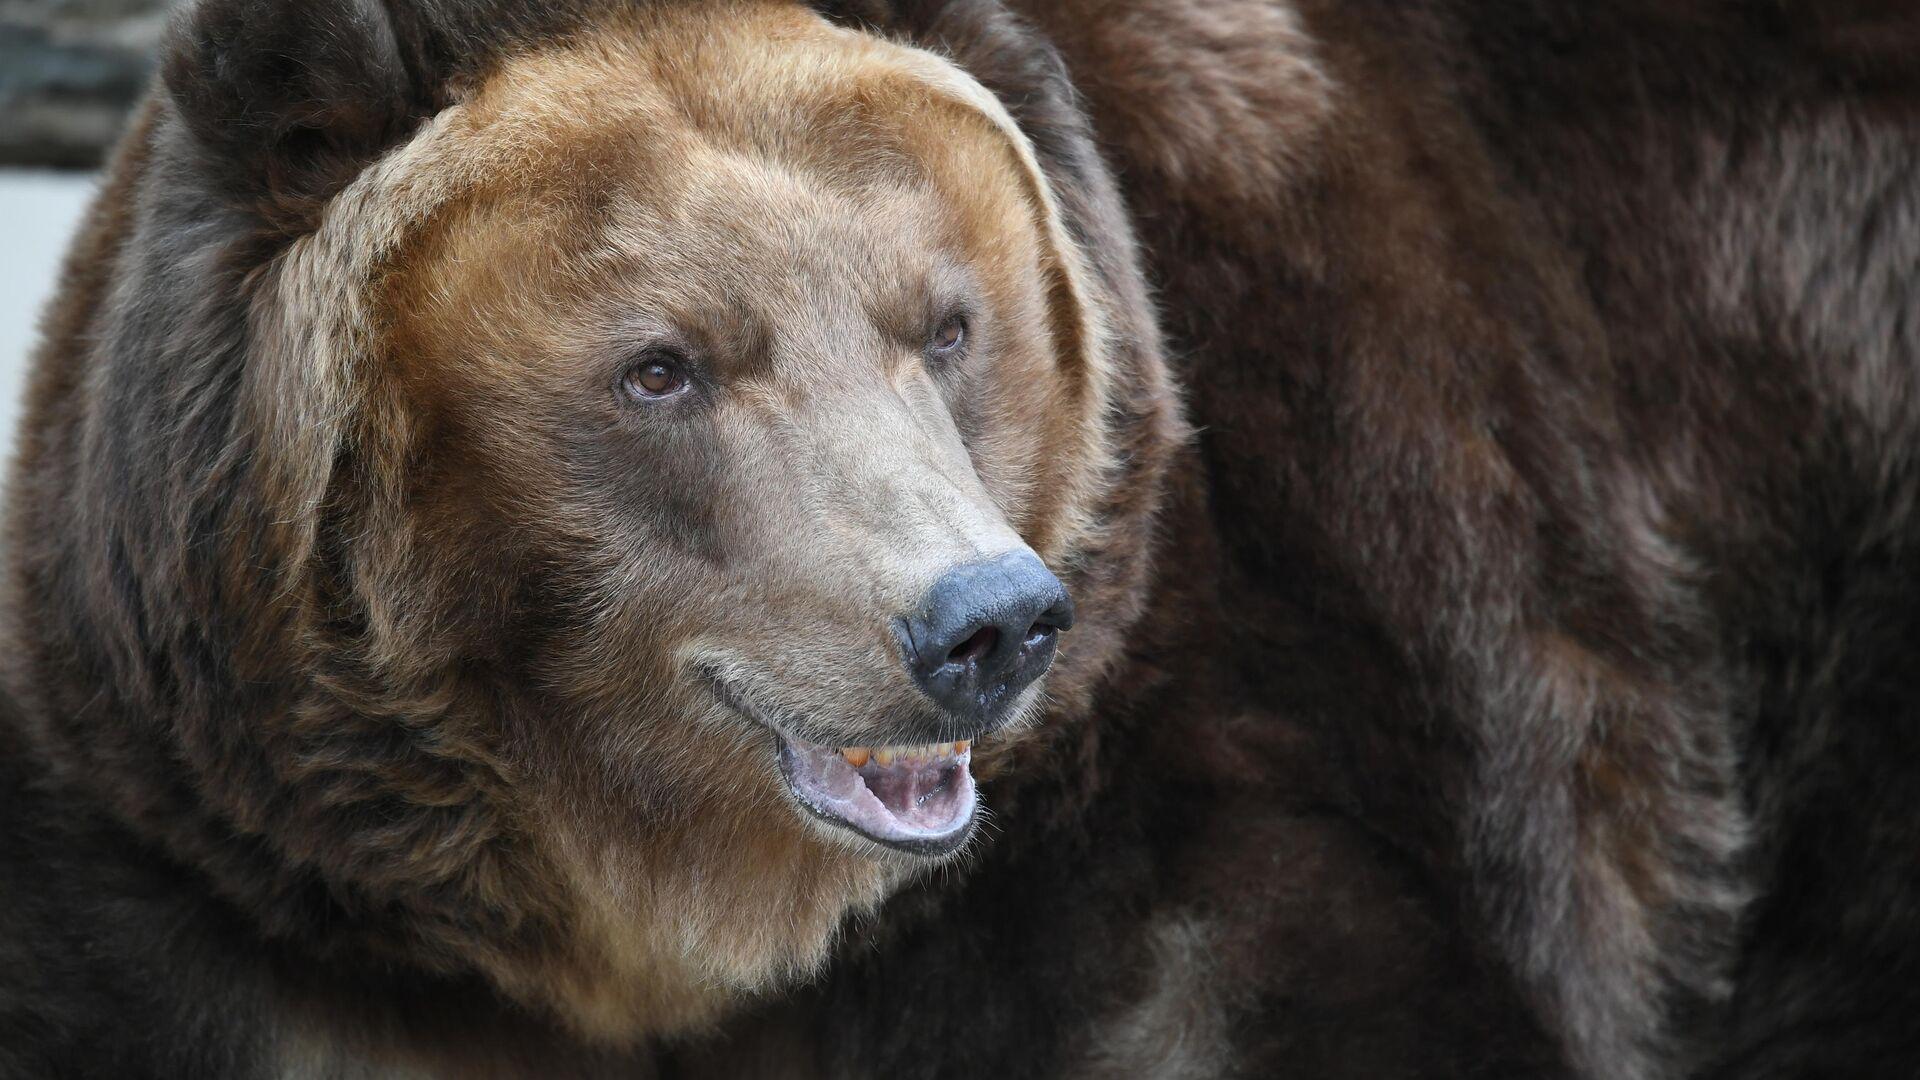 Бурый медведь - РИА Новости, 1920, 18.09.2020